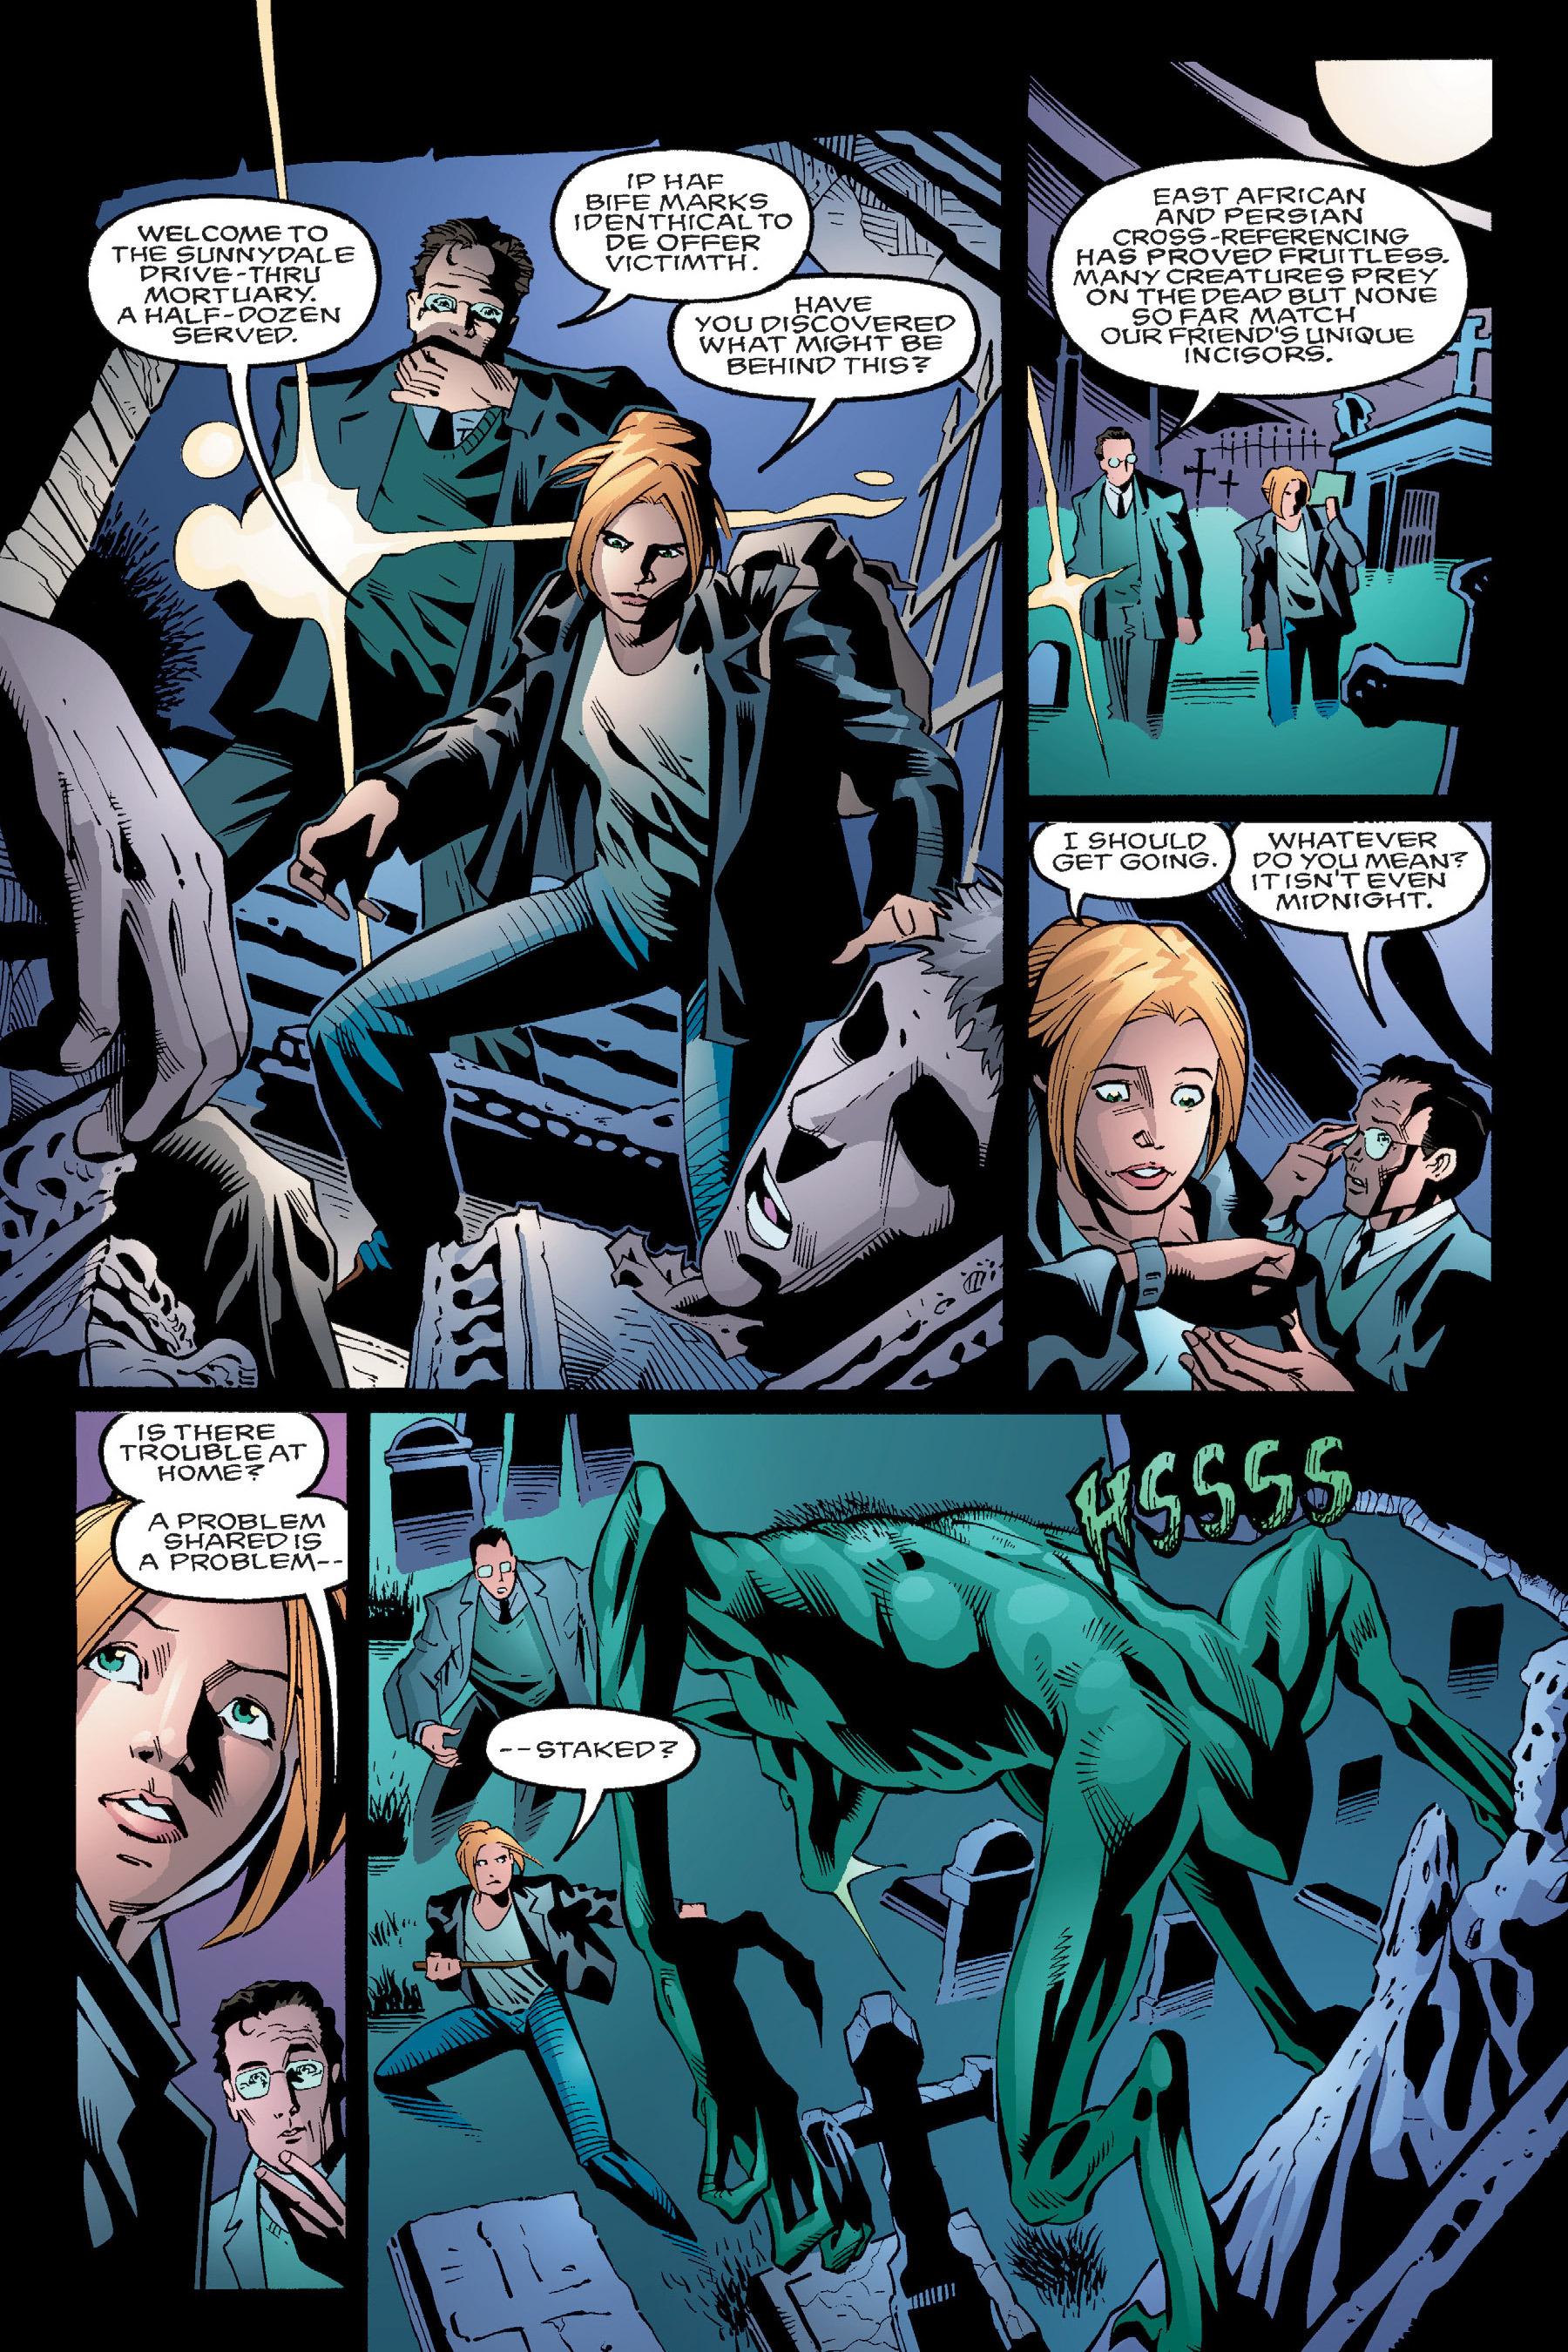 Read online Buffy the Vampire Slayer: Omnibus comic -  Issue # TPB 4 - 24